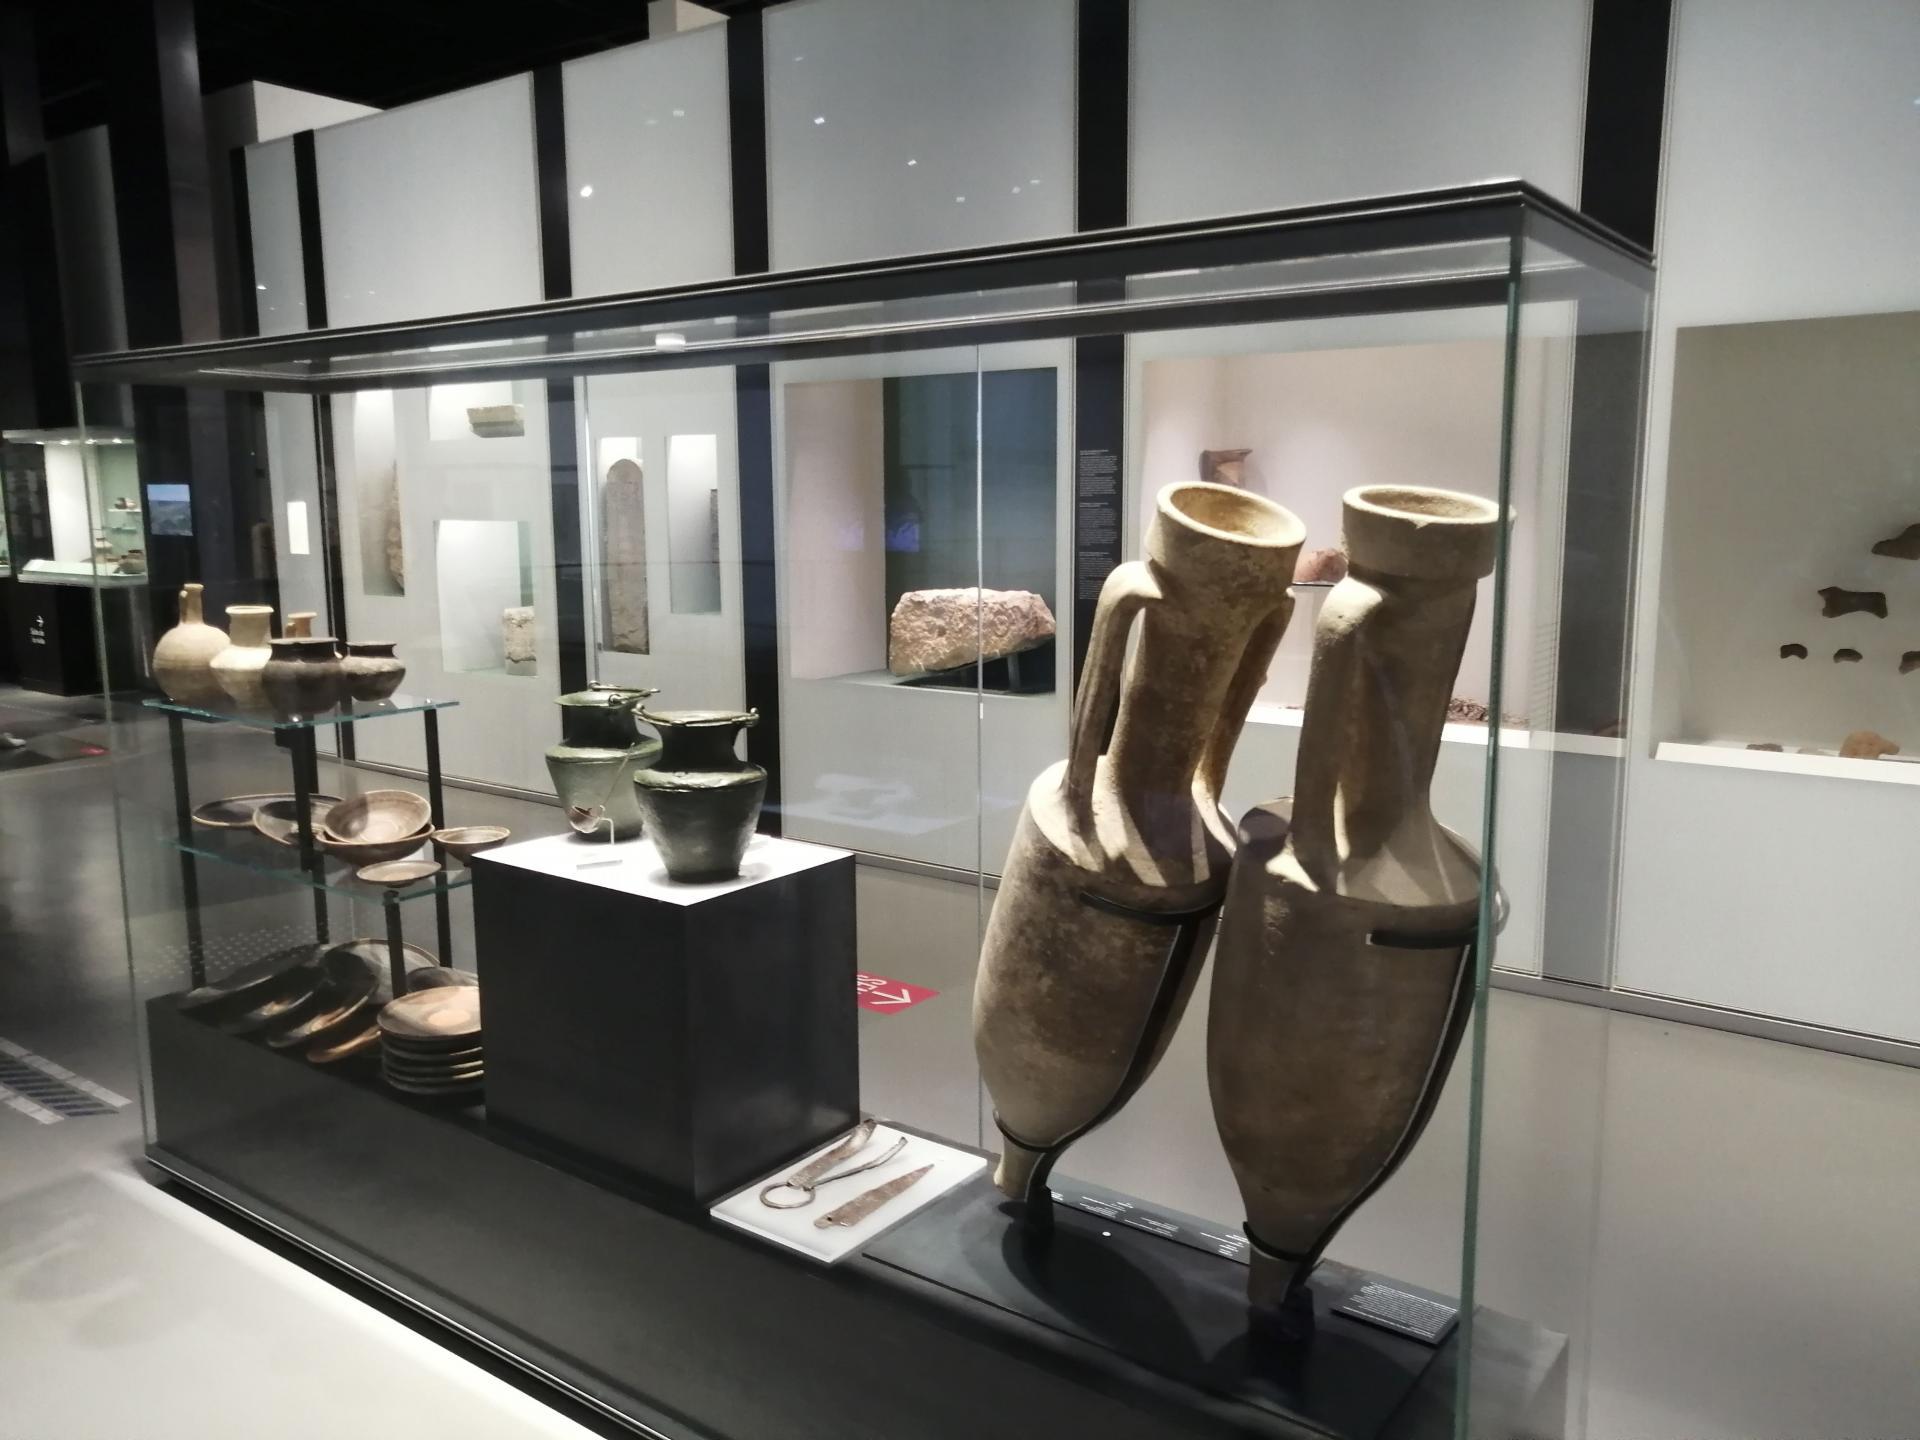 Musee de la romanite 8